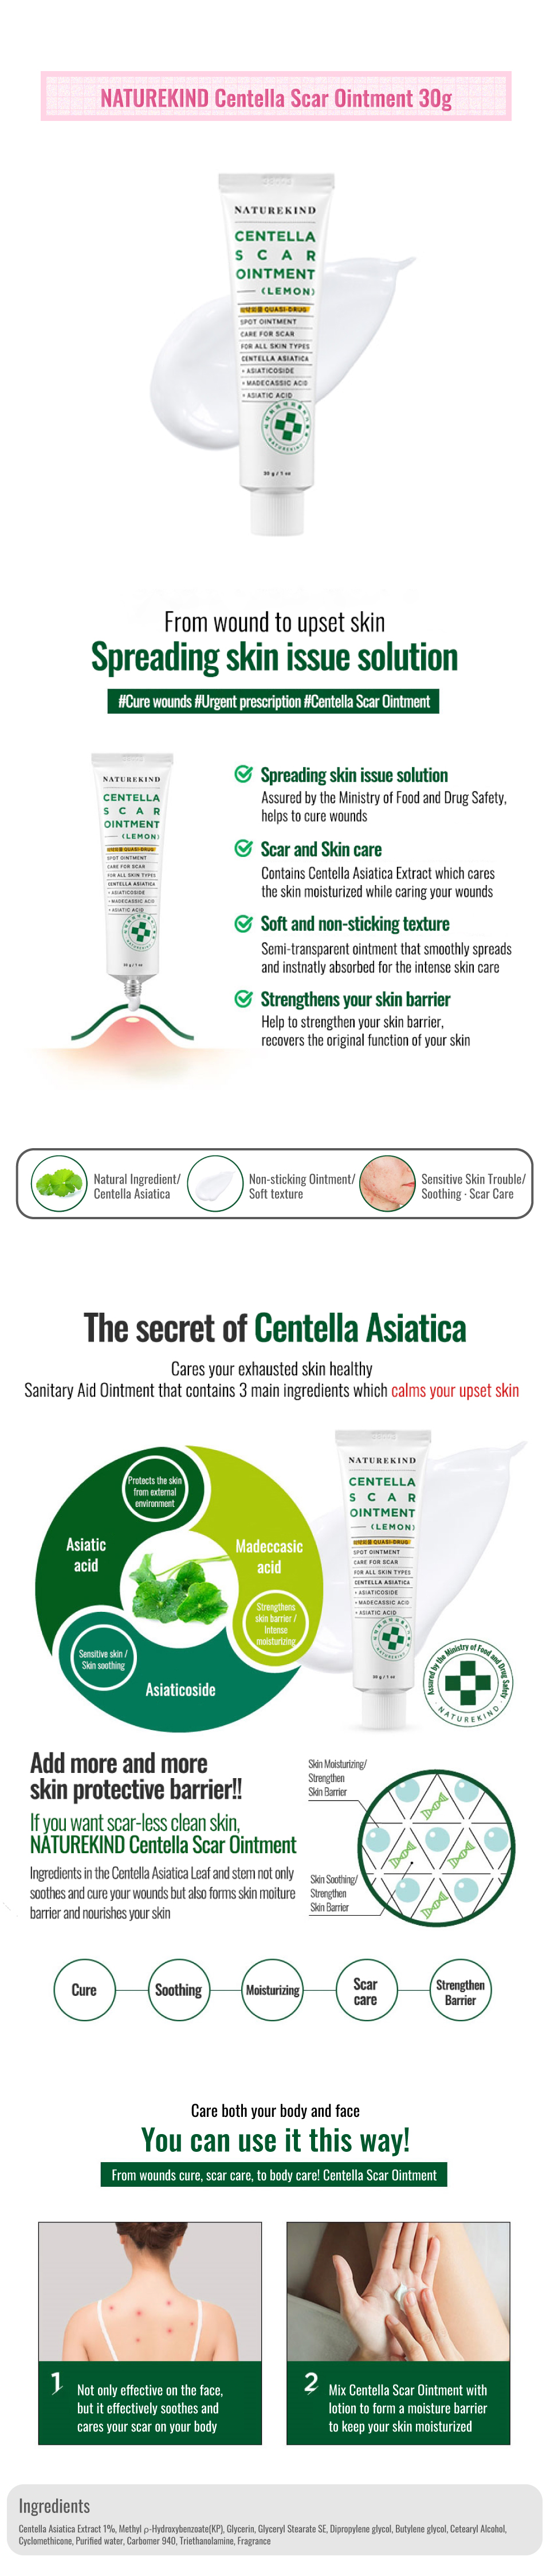 NATUREKIND Centella Scar Ointment